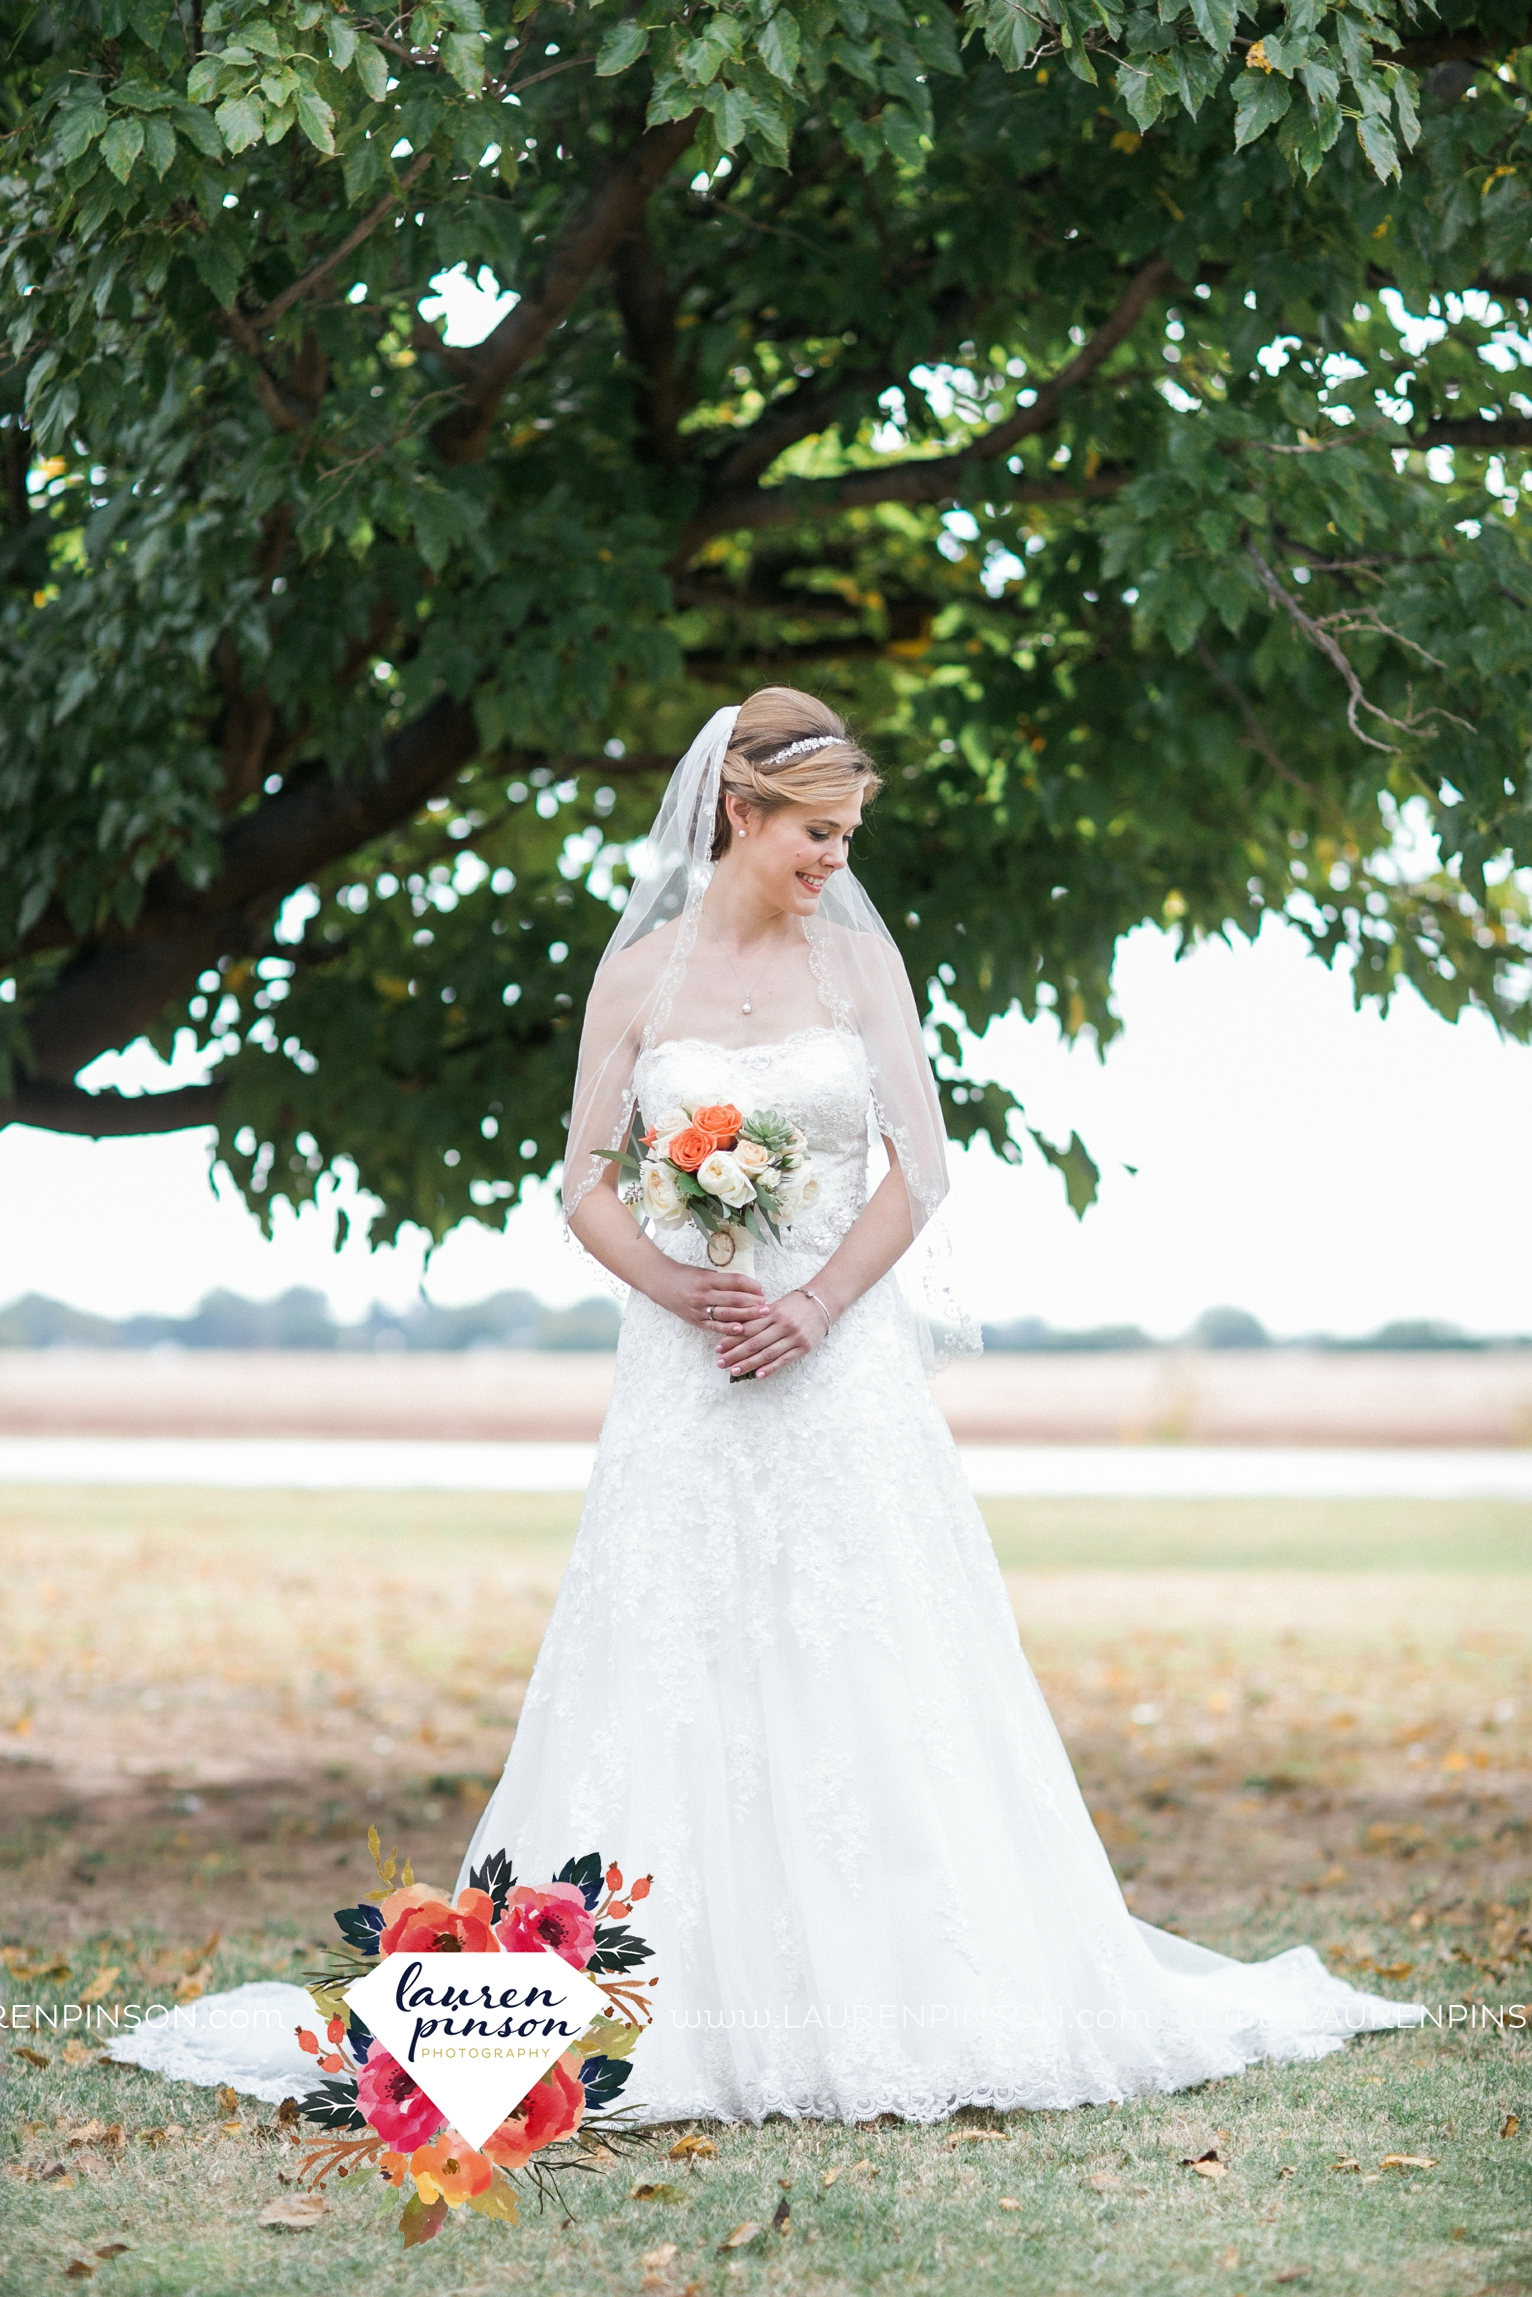 kemp-center-for-the-arts-wichita-falls-texas-wedding-photographer-fall-wedding-pumpkins-134.jpg